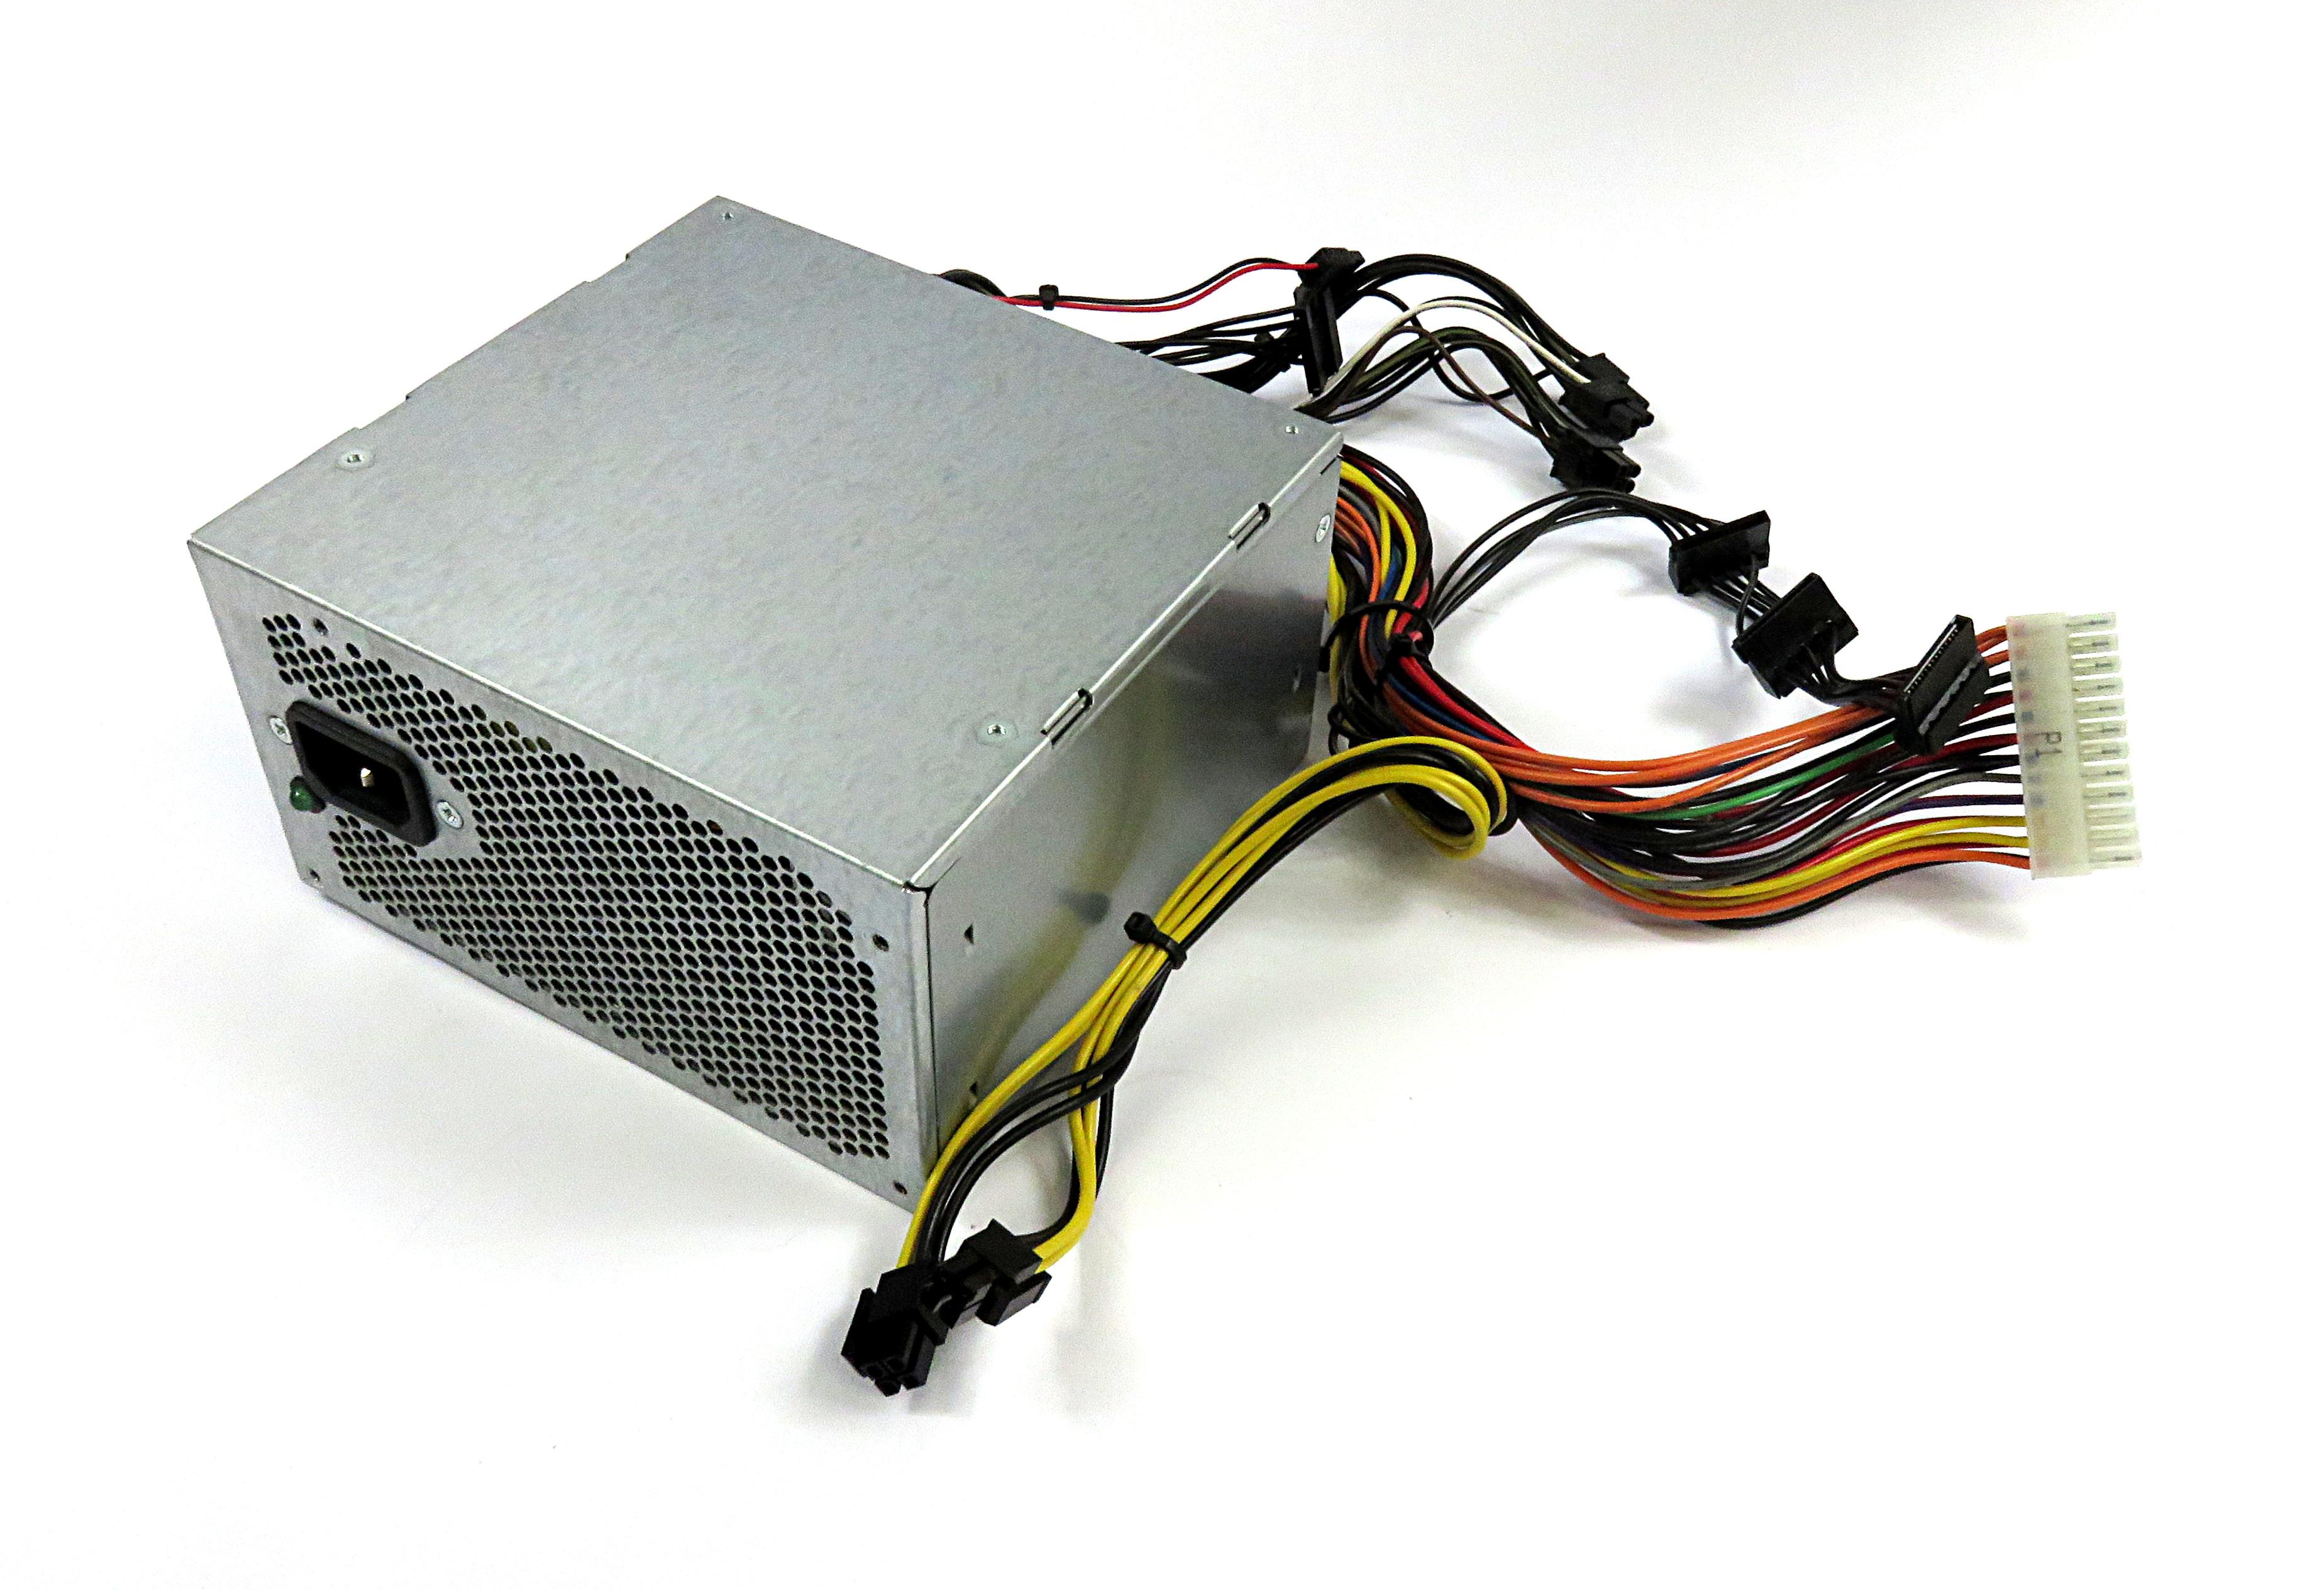 HP 832006-003 600W 24-Pin ATX PSU - Delta DPS-600WB B